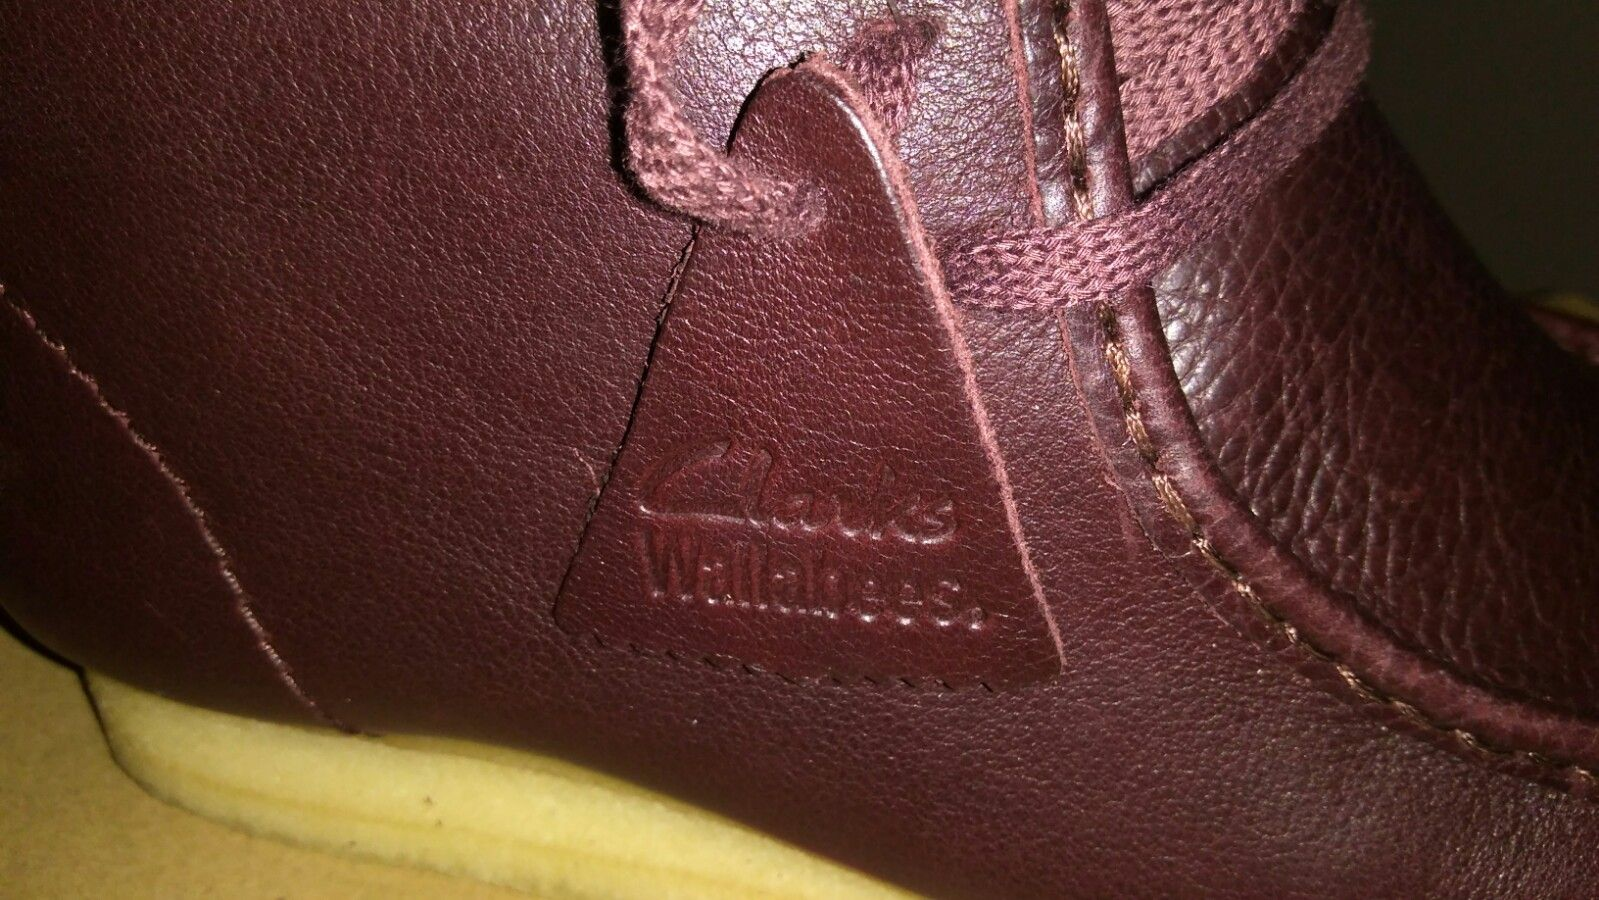 #ClarksUSA #limitededition in #BurgundyWallabee #tumbledleather -